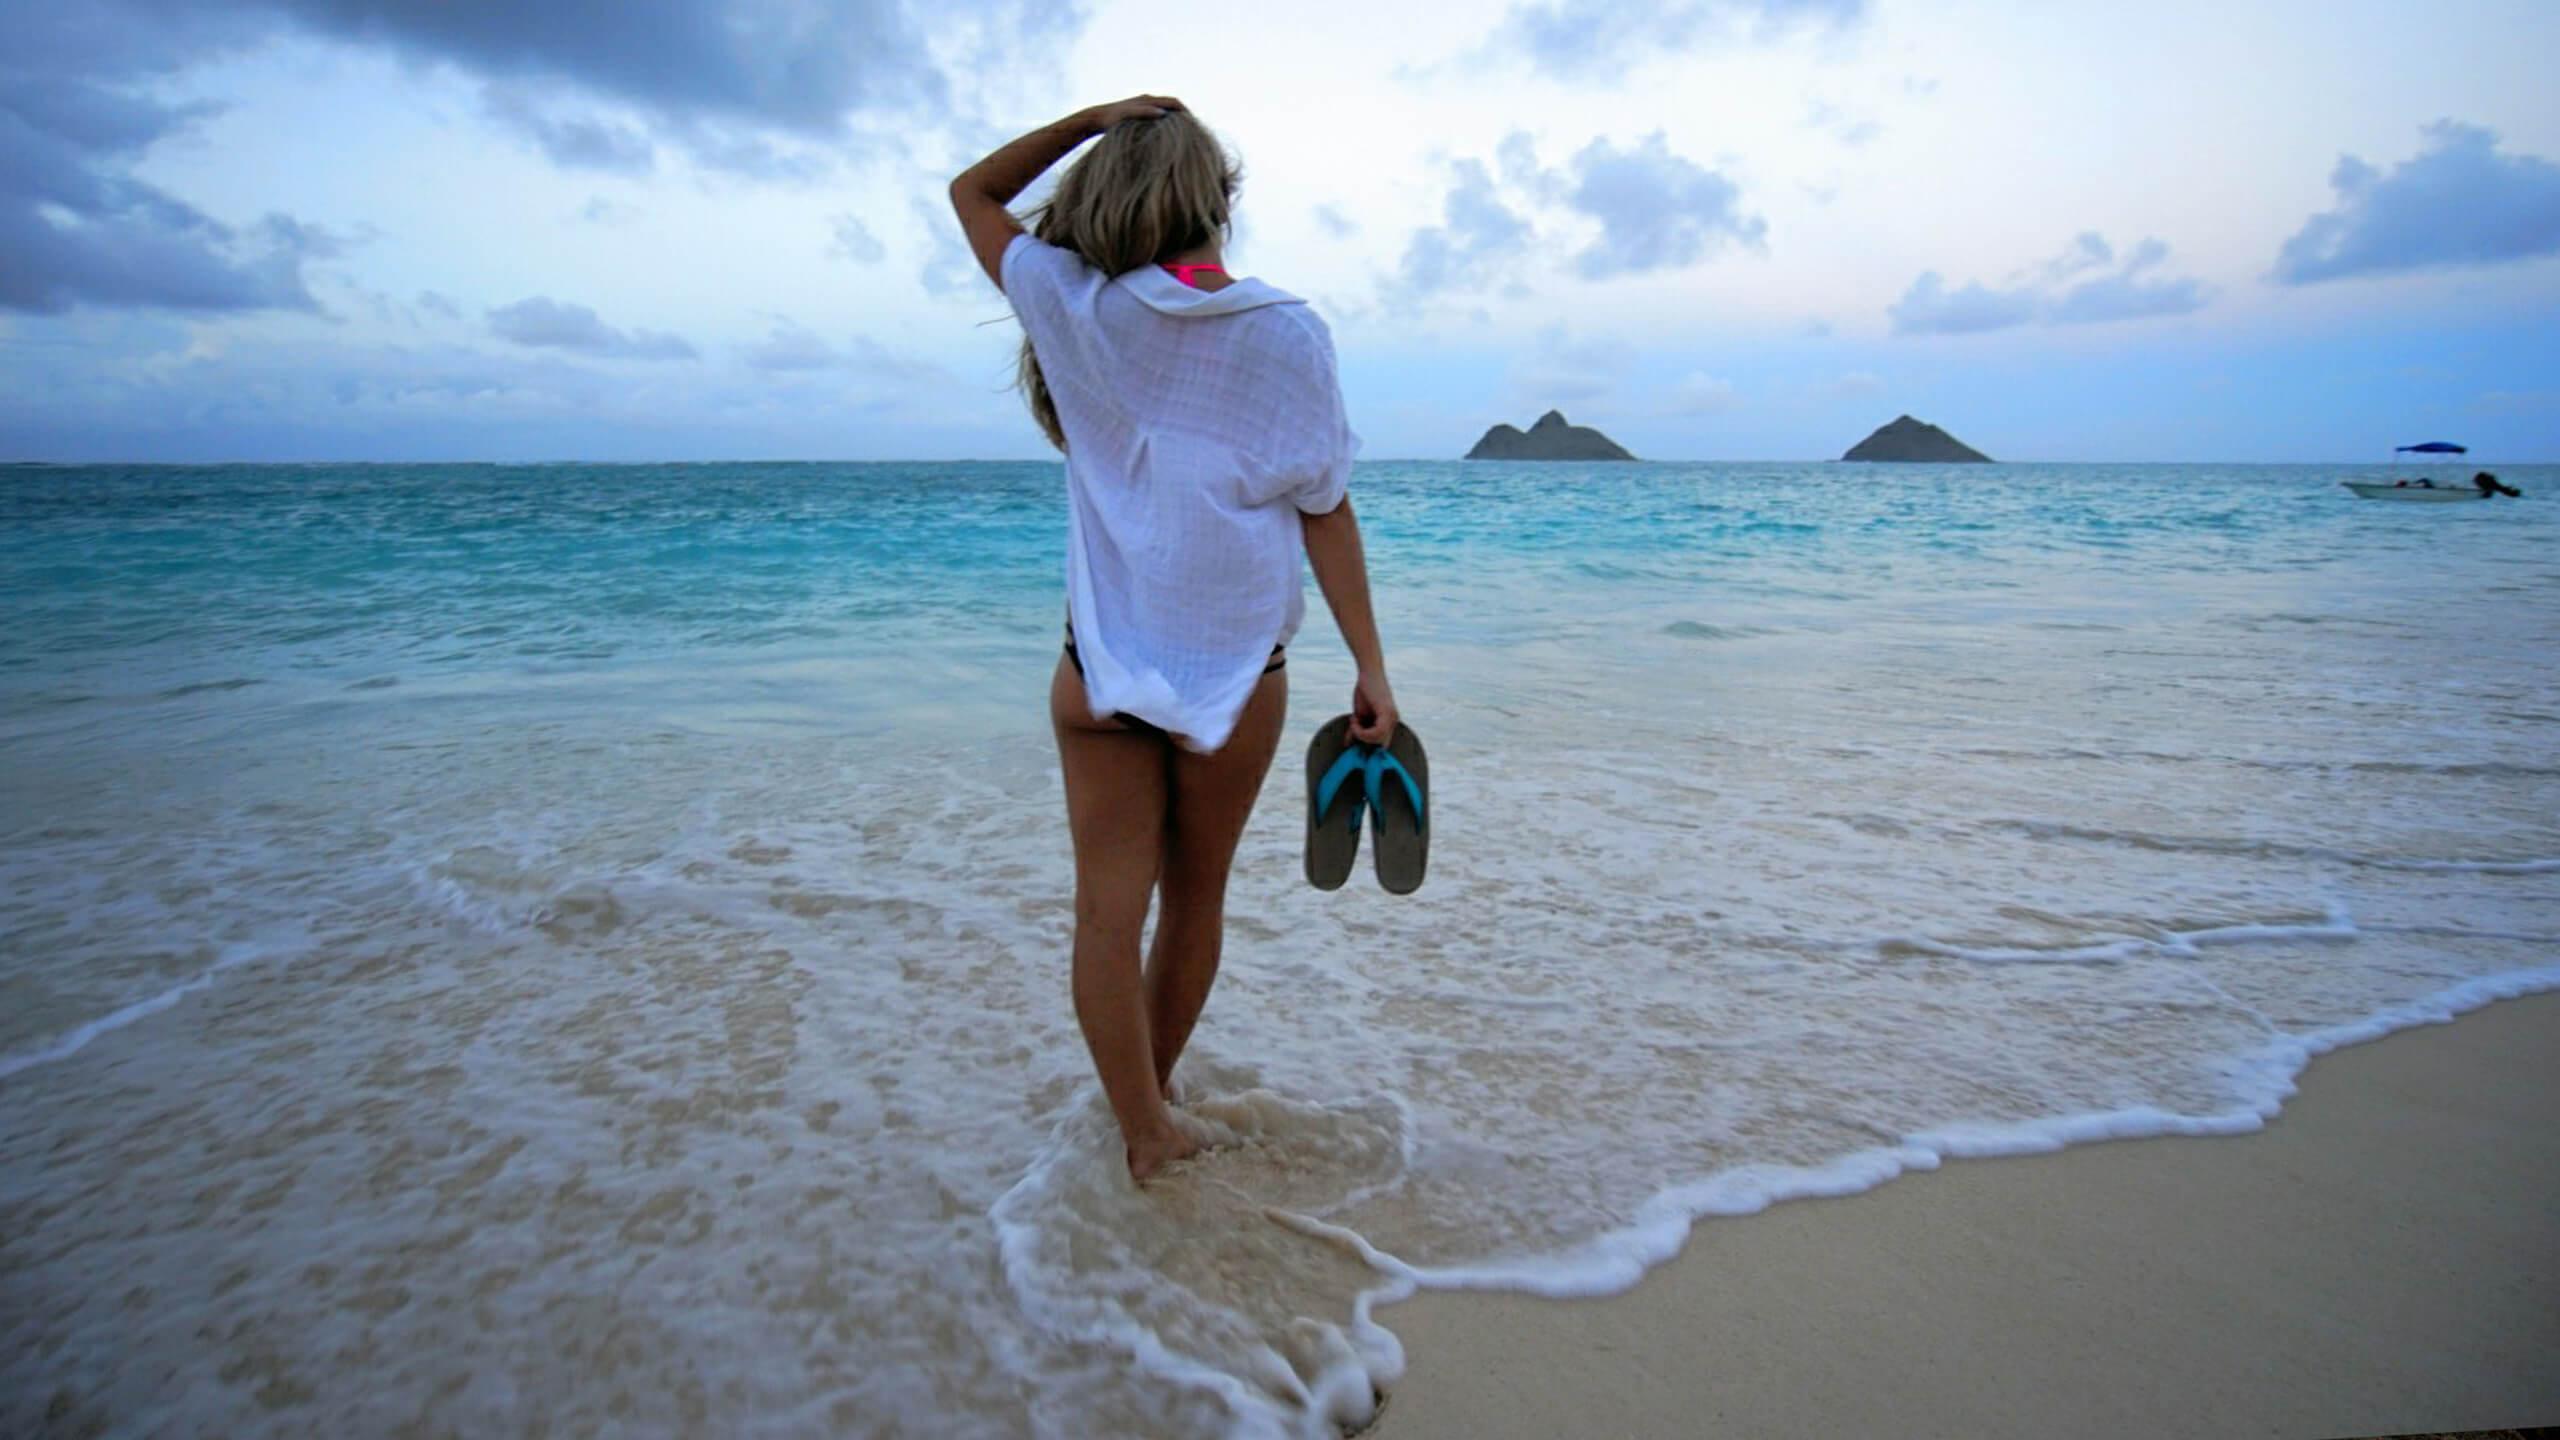 Authentic Fashion, Resort, Beach Hawaiian Slipper not Flip Flop | Made in USA | Island Slipperslp-logo-textAsset 1Asset 5Asset 1icon-twitterShapeicon-instagramslp-logo-text